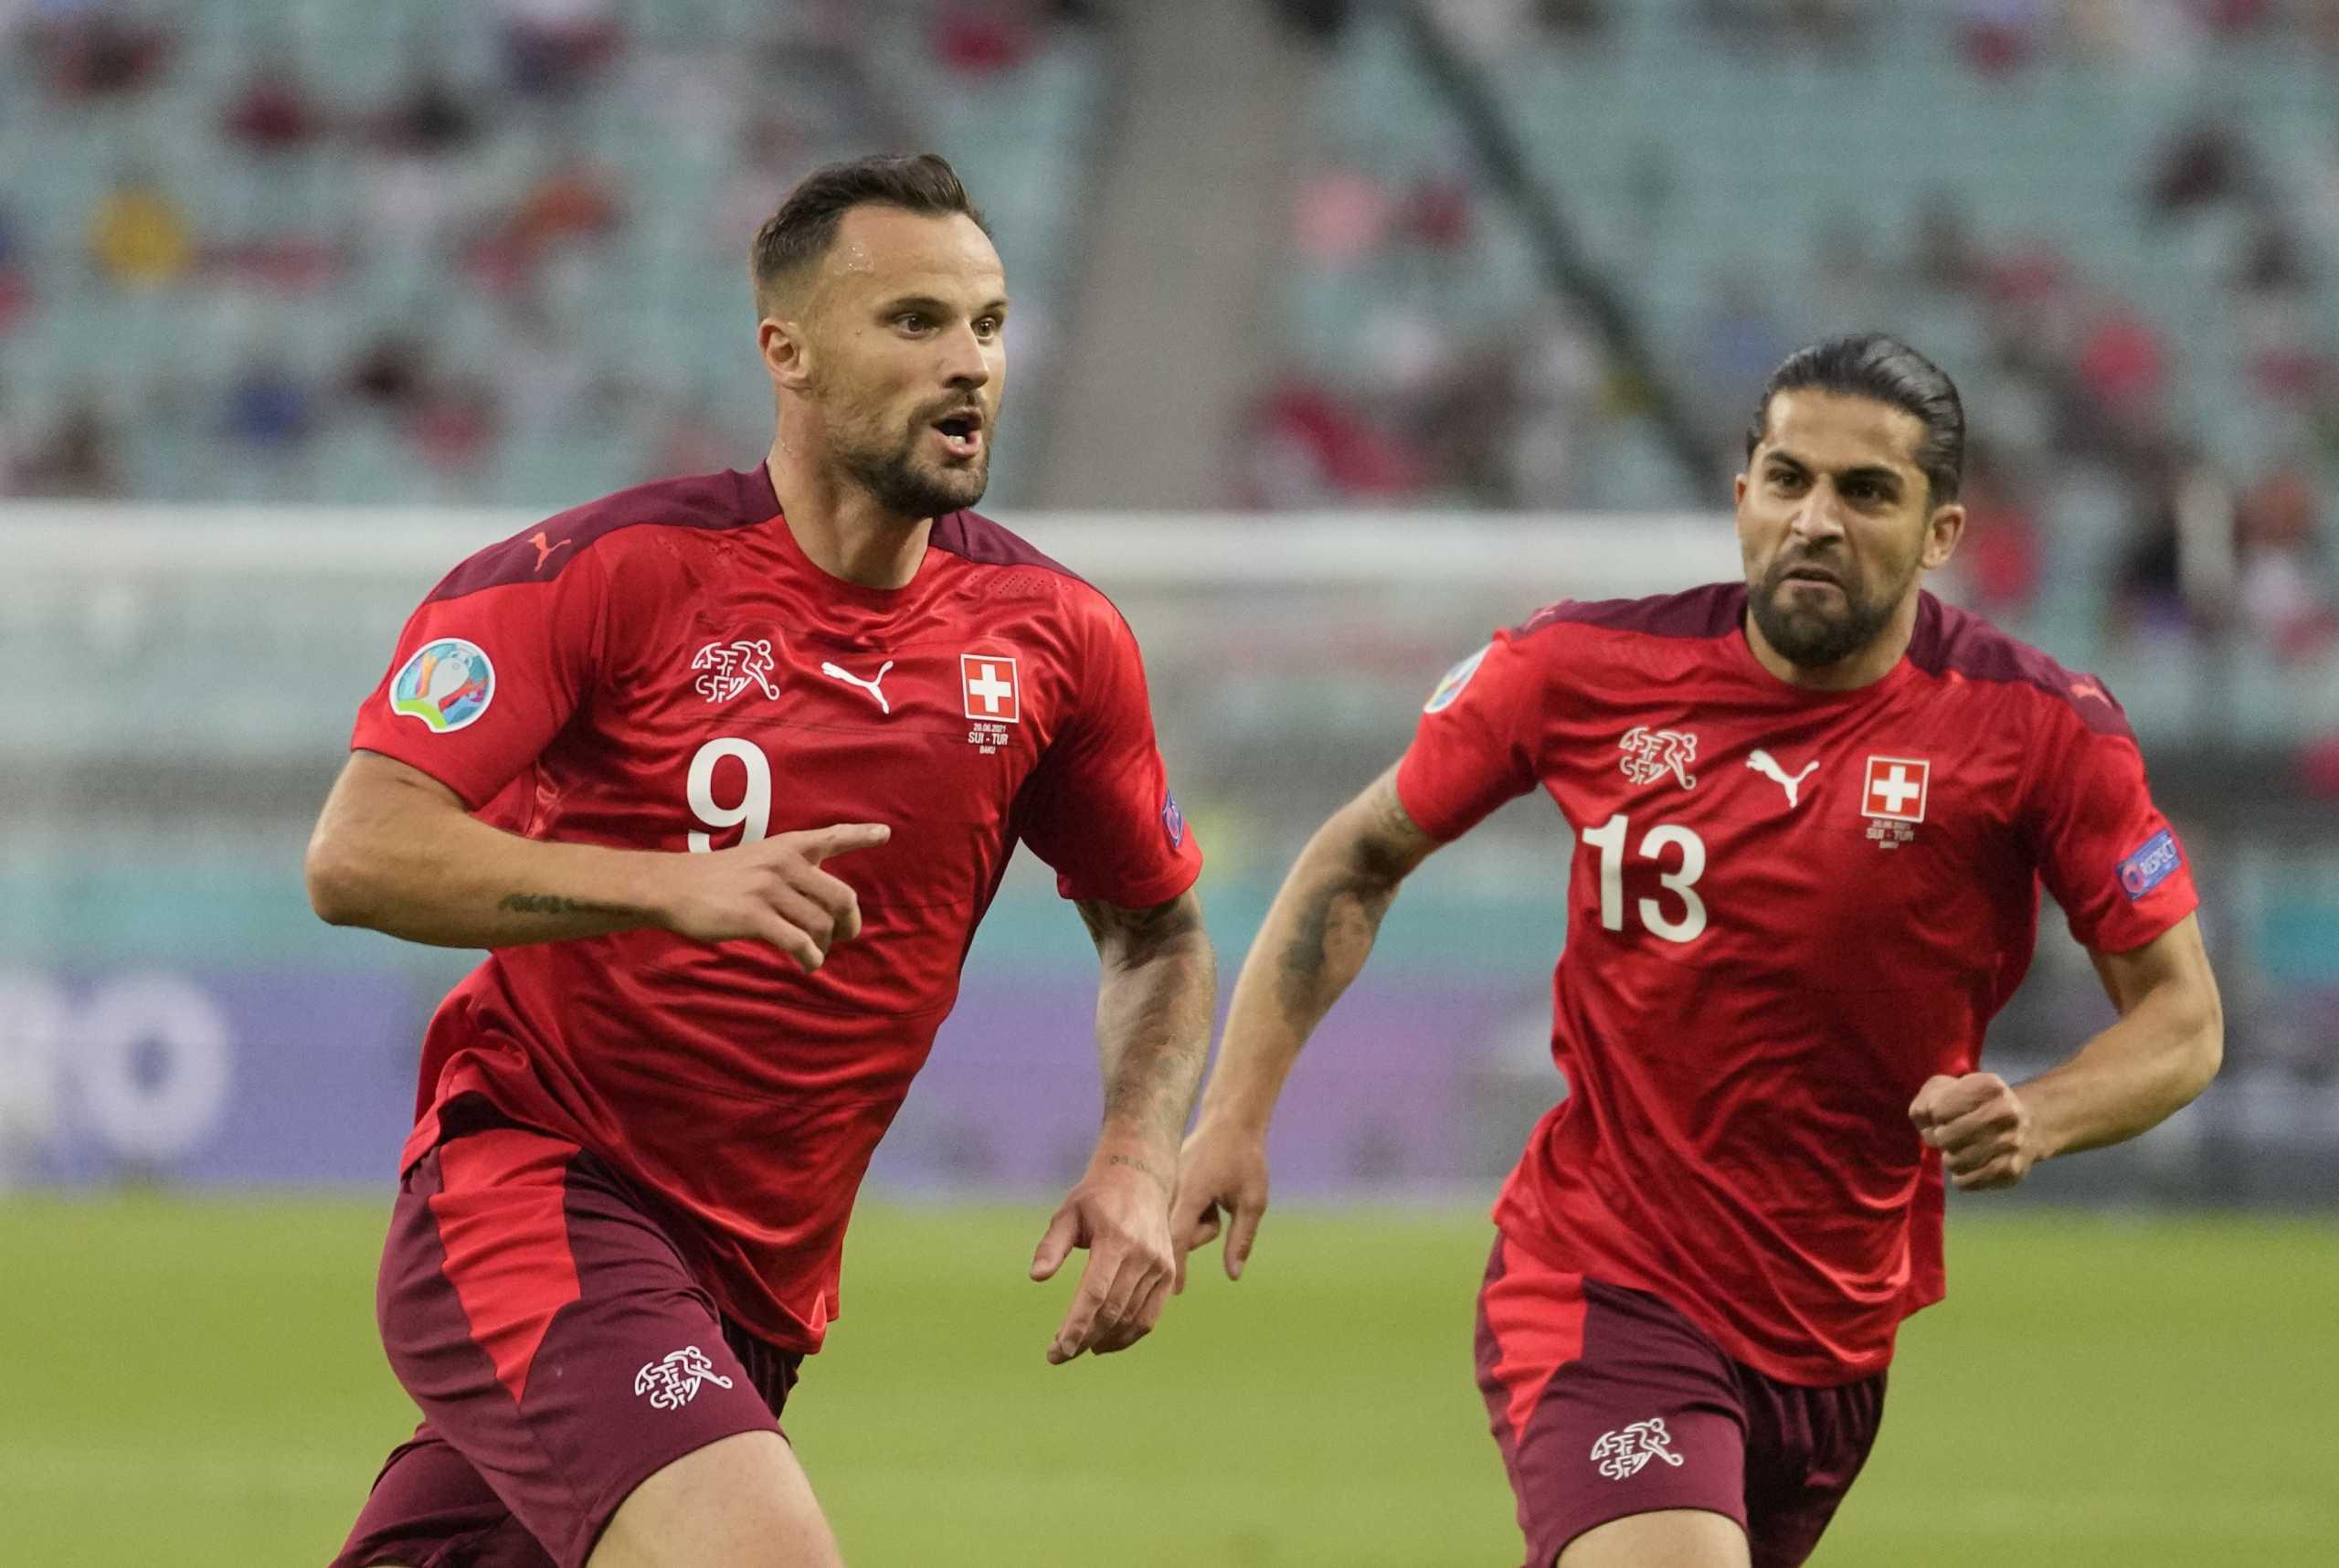 Euro 2020, Ελβετία – Τουρκία: Ο Σεφέροβιτς «σόκαρε» νωρίς τους γείτονες